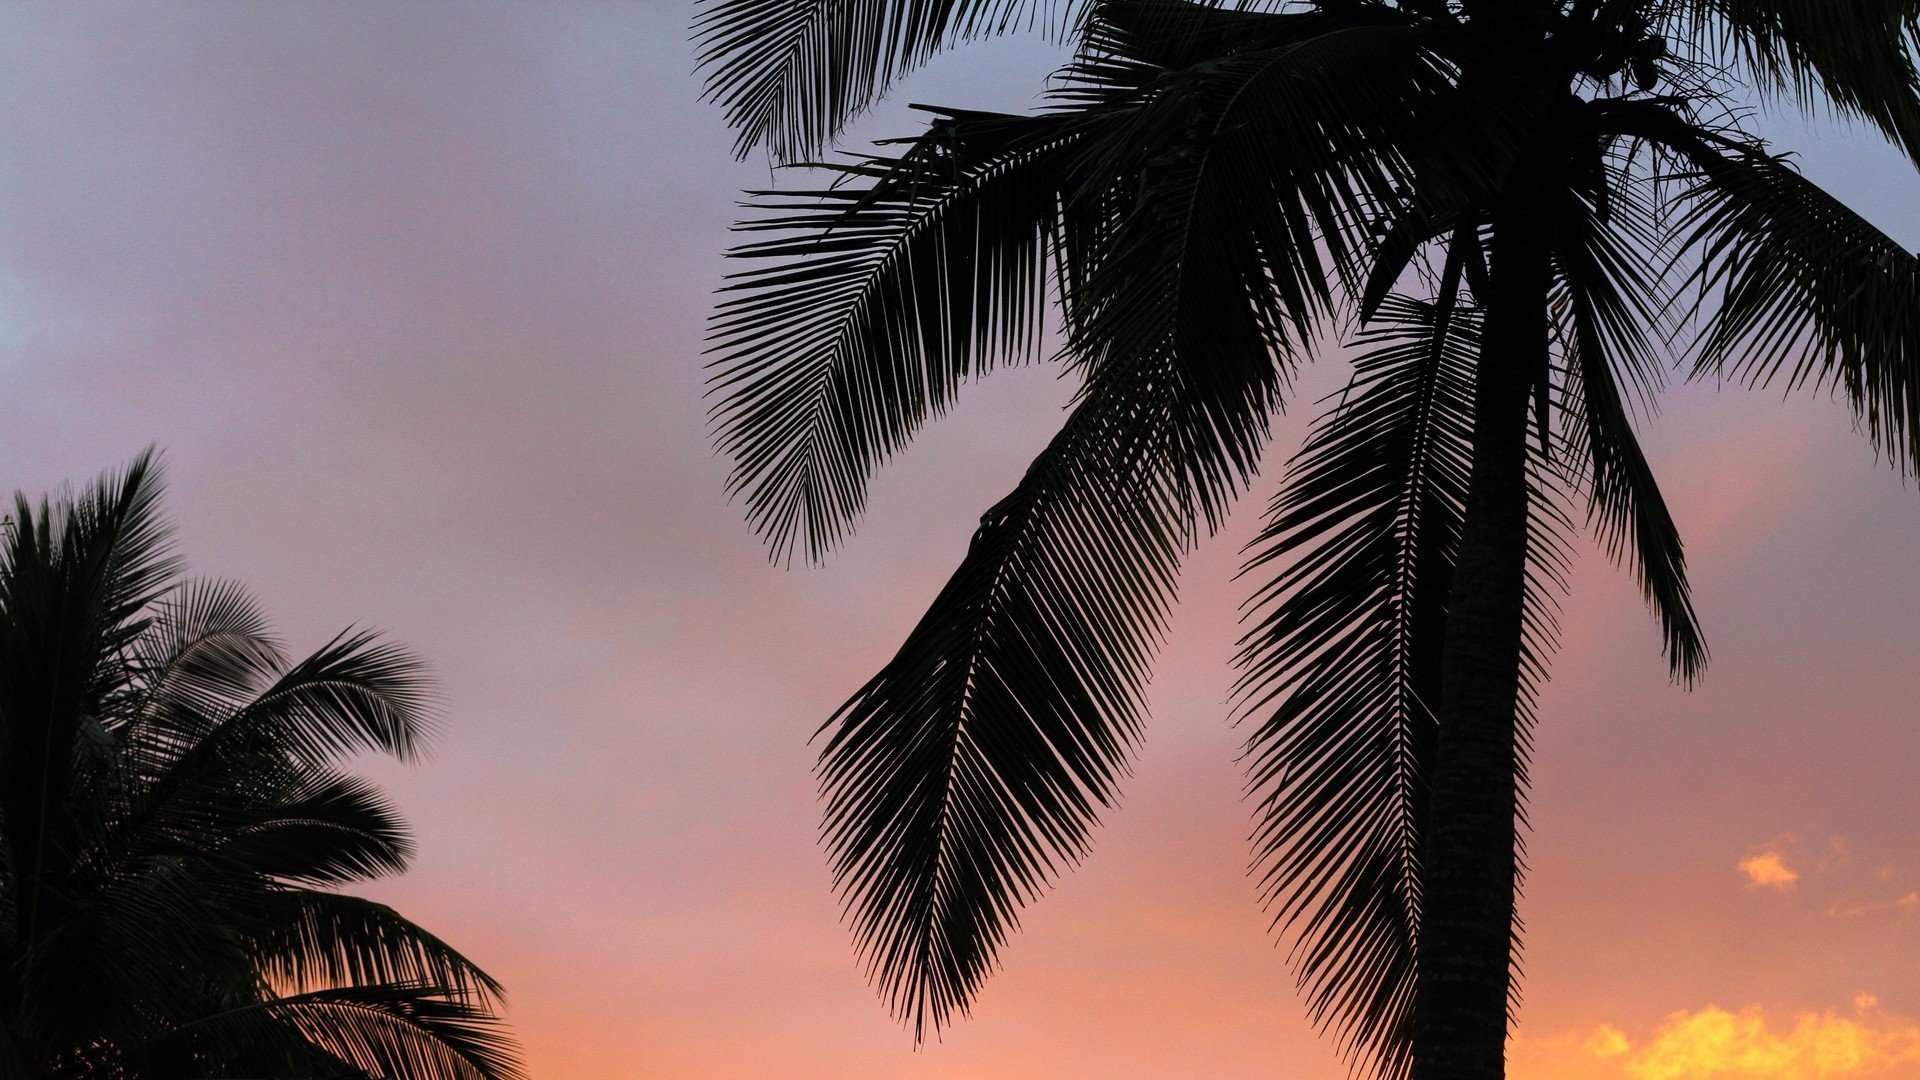 Palm Tree Screensaver hd wallpaper download